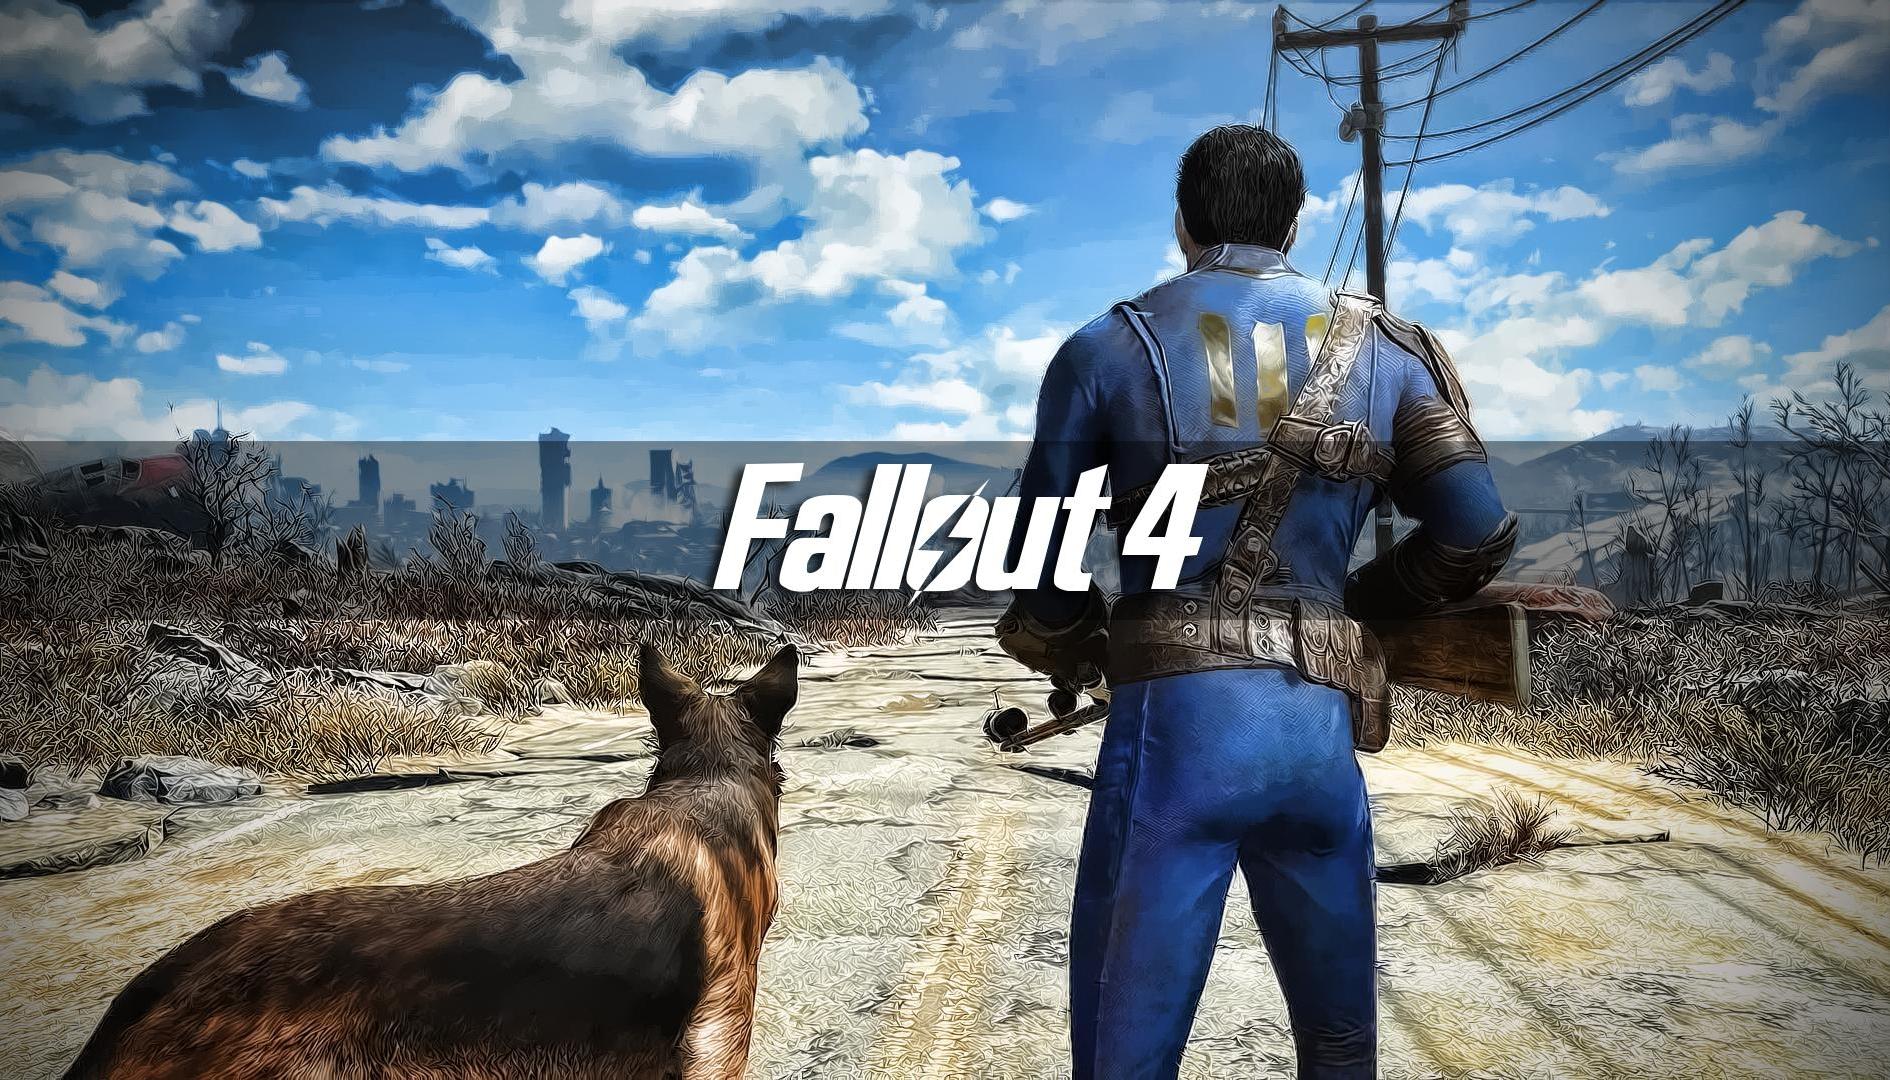 Fallout 4, lo studio director saluta un'ultima volta River